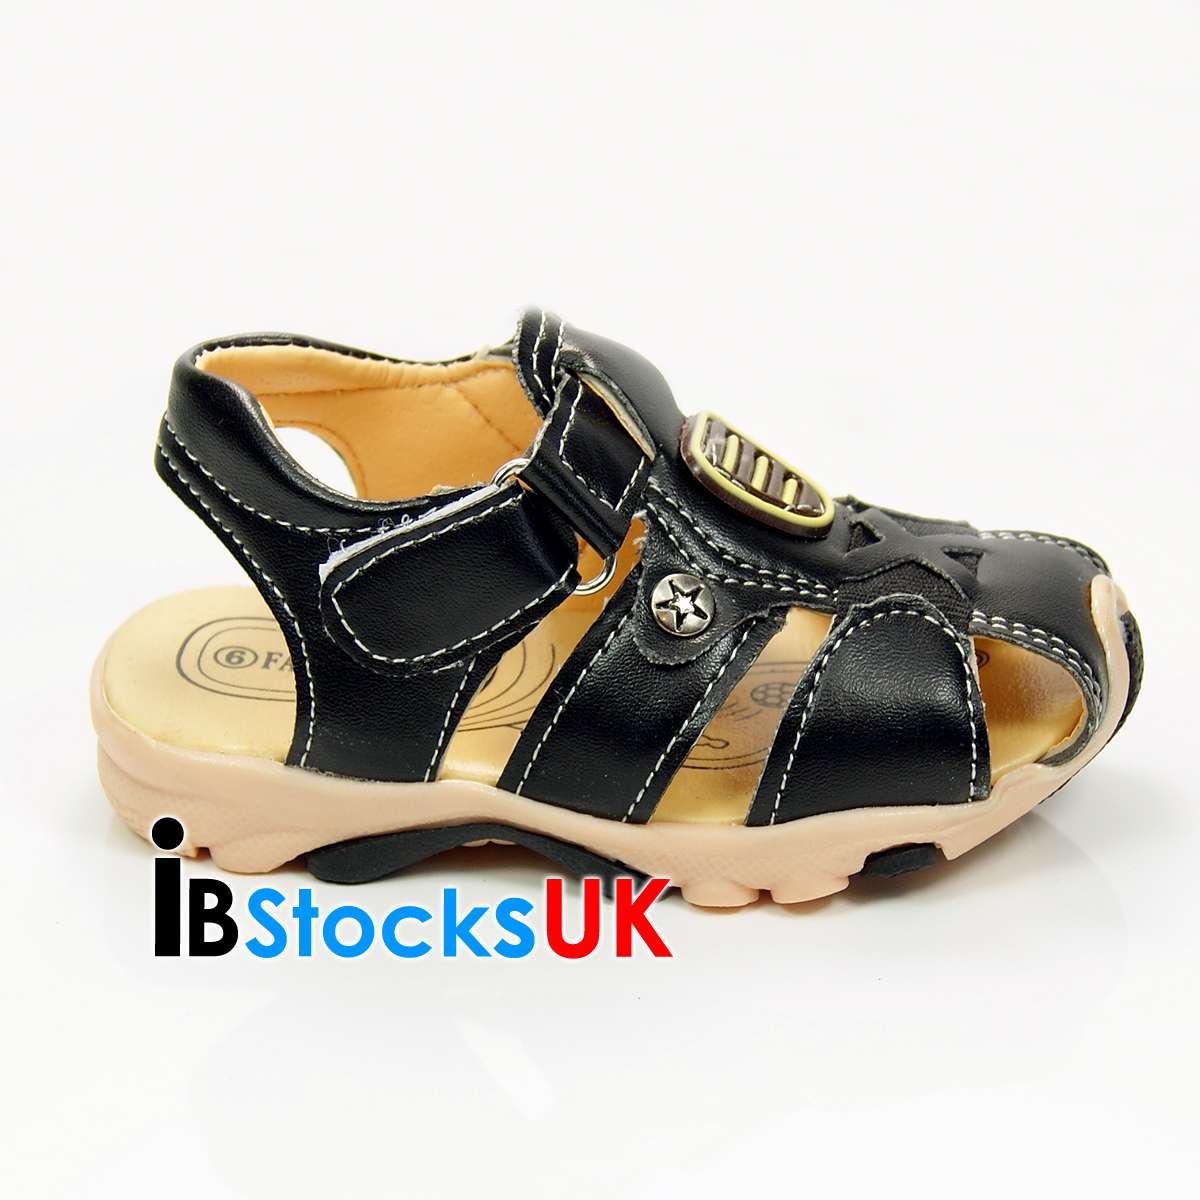 kleinkind jungen sommer sandalen klettband cute kinder schuhe 37 38 39 40 41 neu ebay. Black Bedroom Furniture Sets. Home Design Ideas